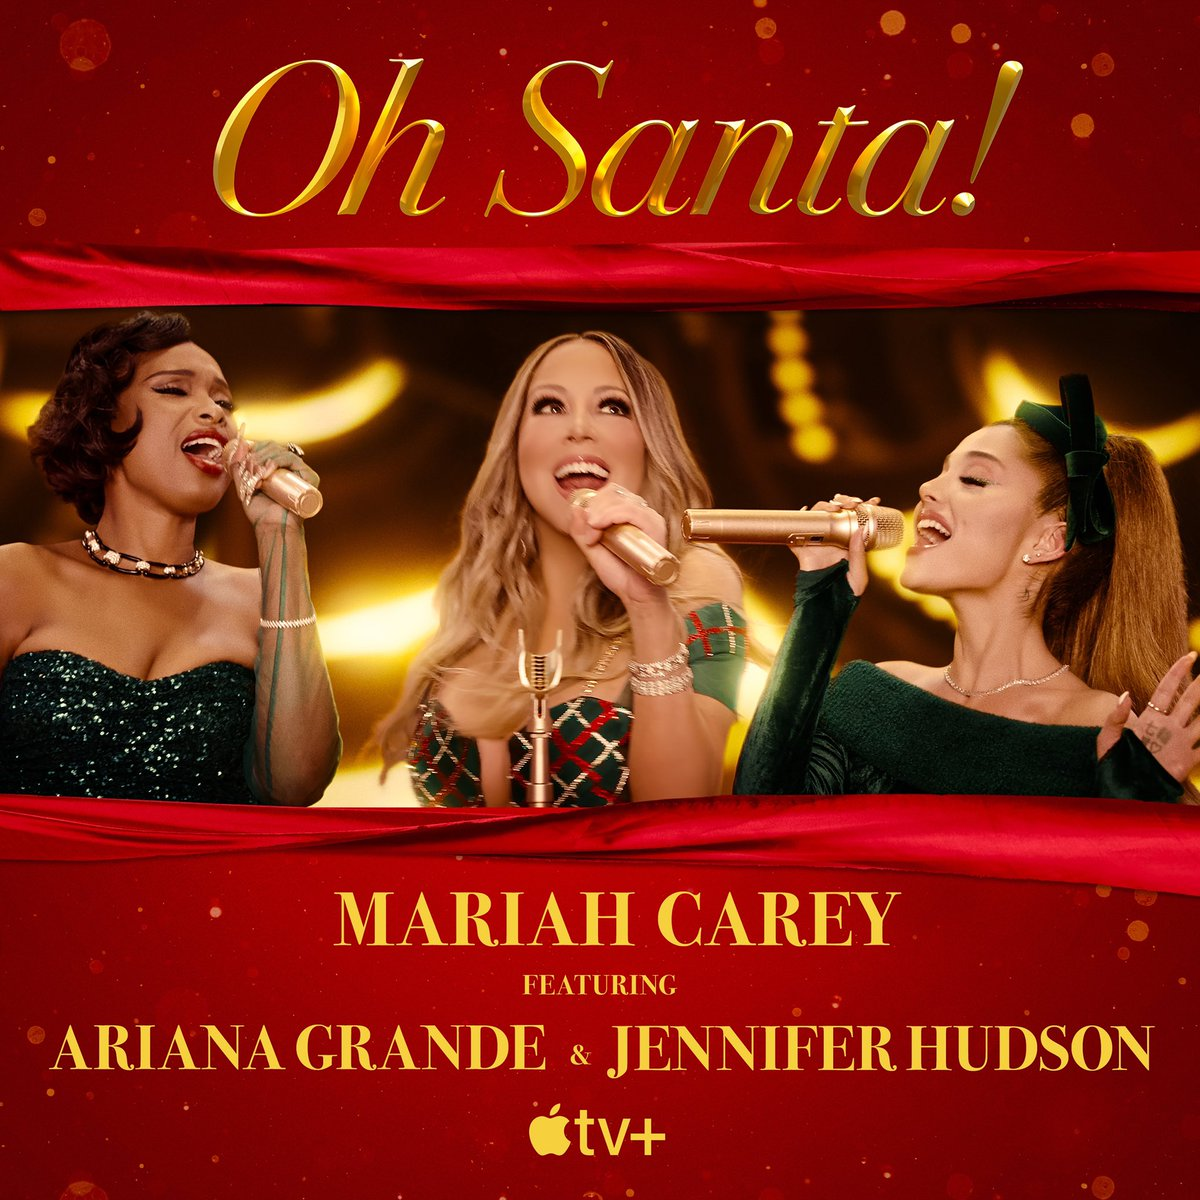 Replying to @MariahCarey: MC x AG x JH 🎤🎤🎤🎅🏼 #OhSanta